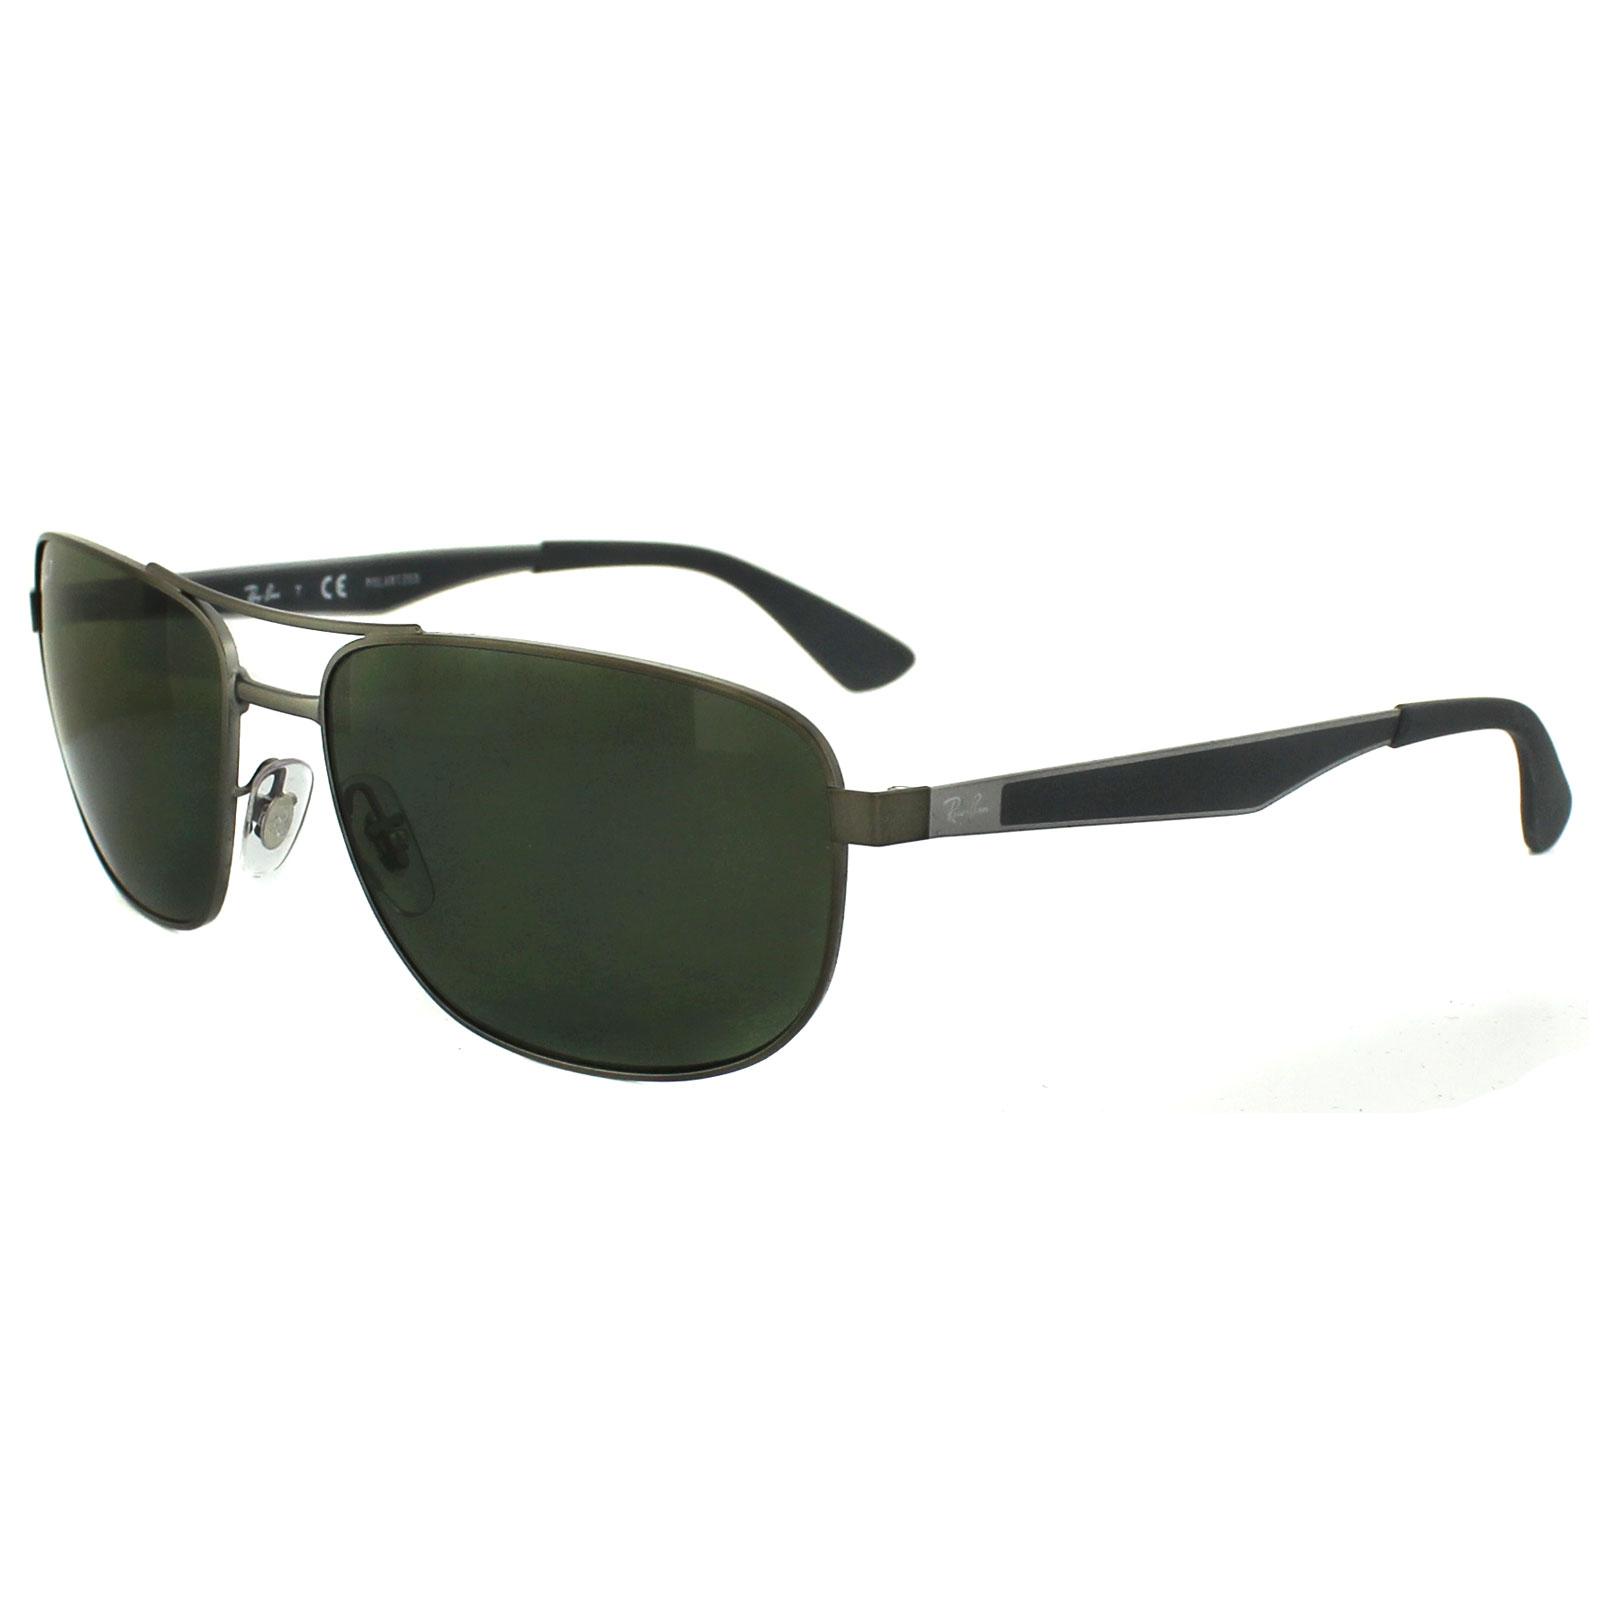 ray ban sunglasses 3528 029 9a matt gunmetal grey dark. Black Bedroom Furniture Sets. Home Design Ideas